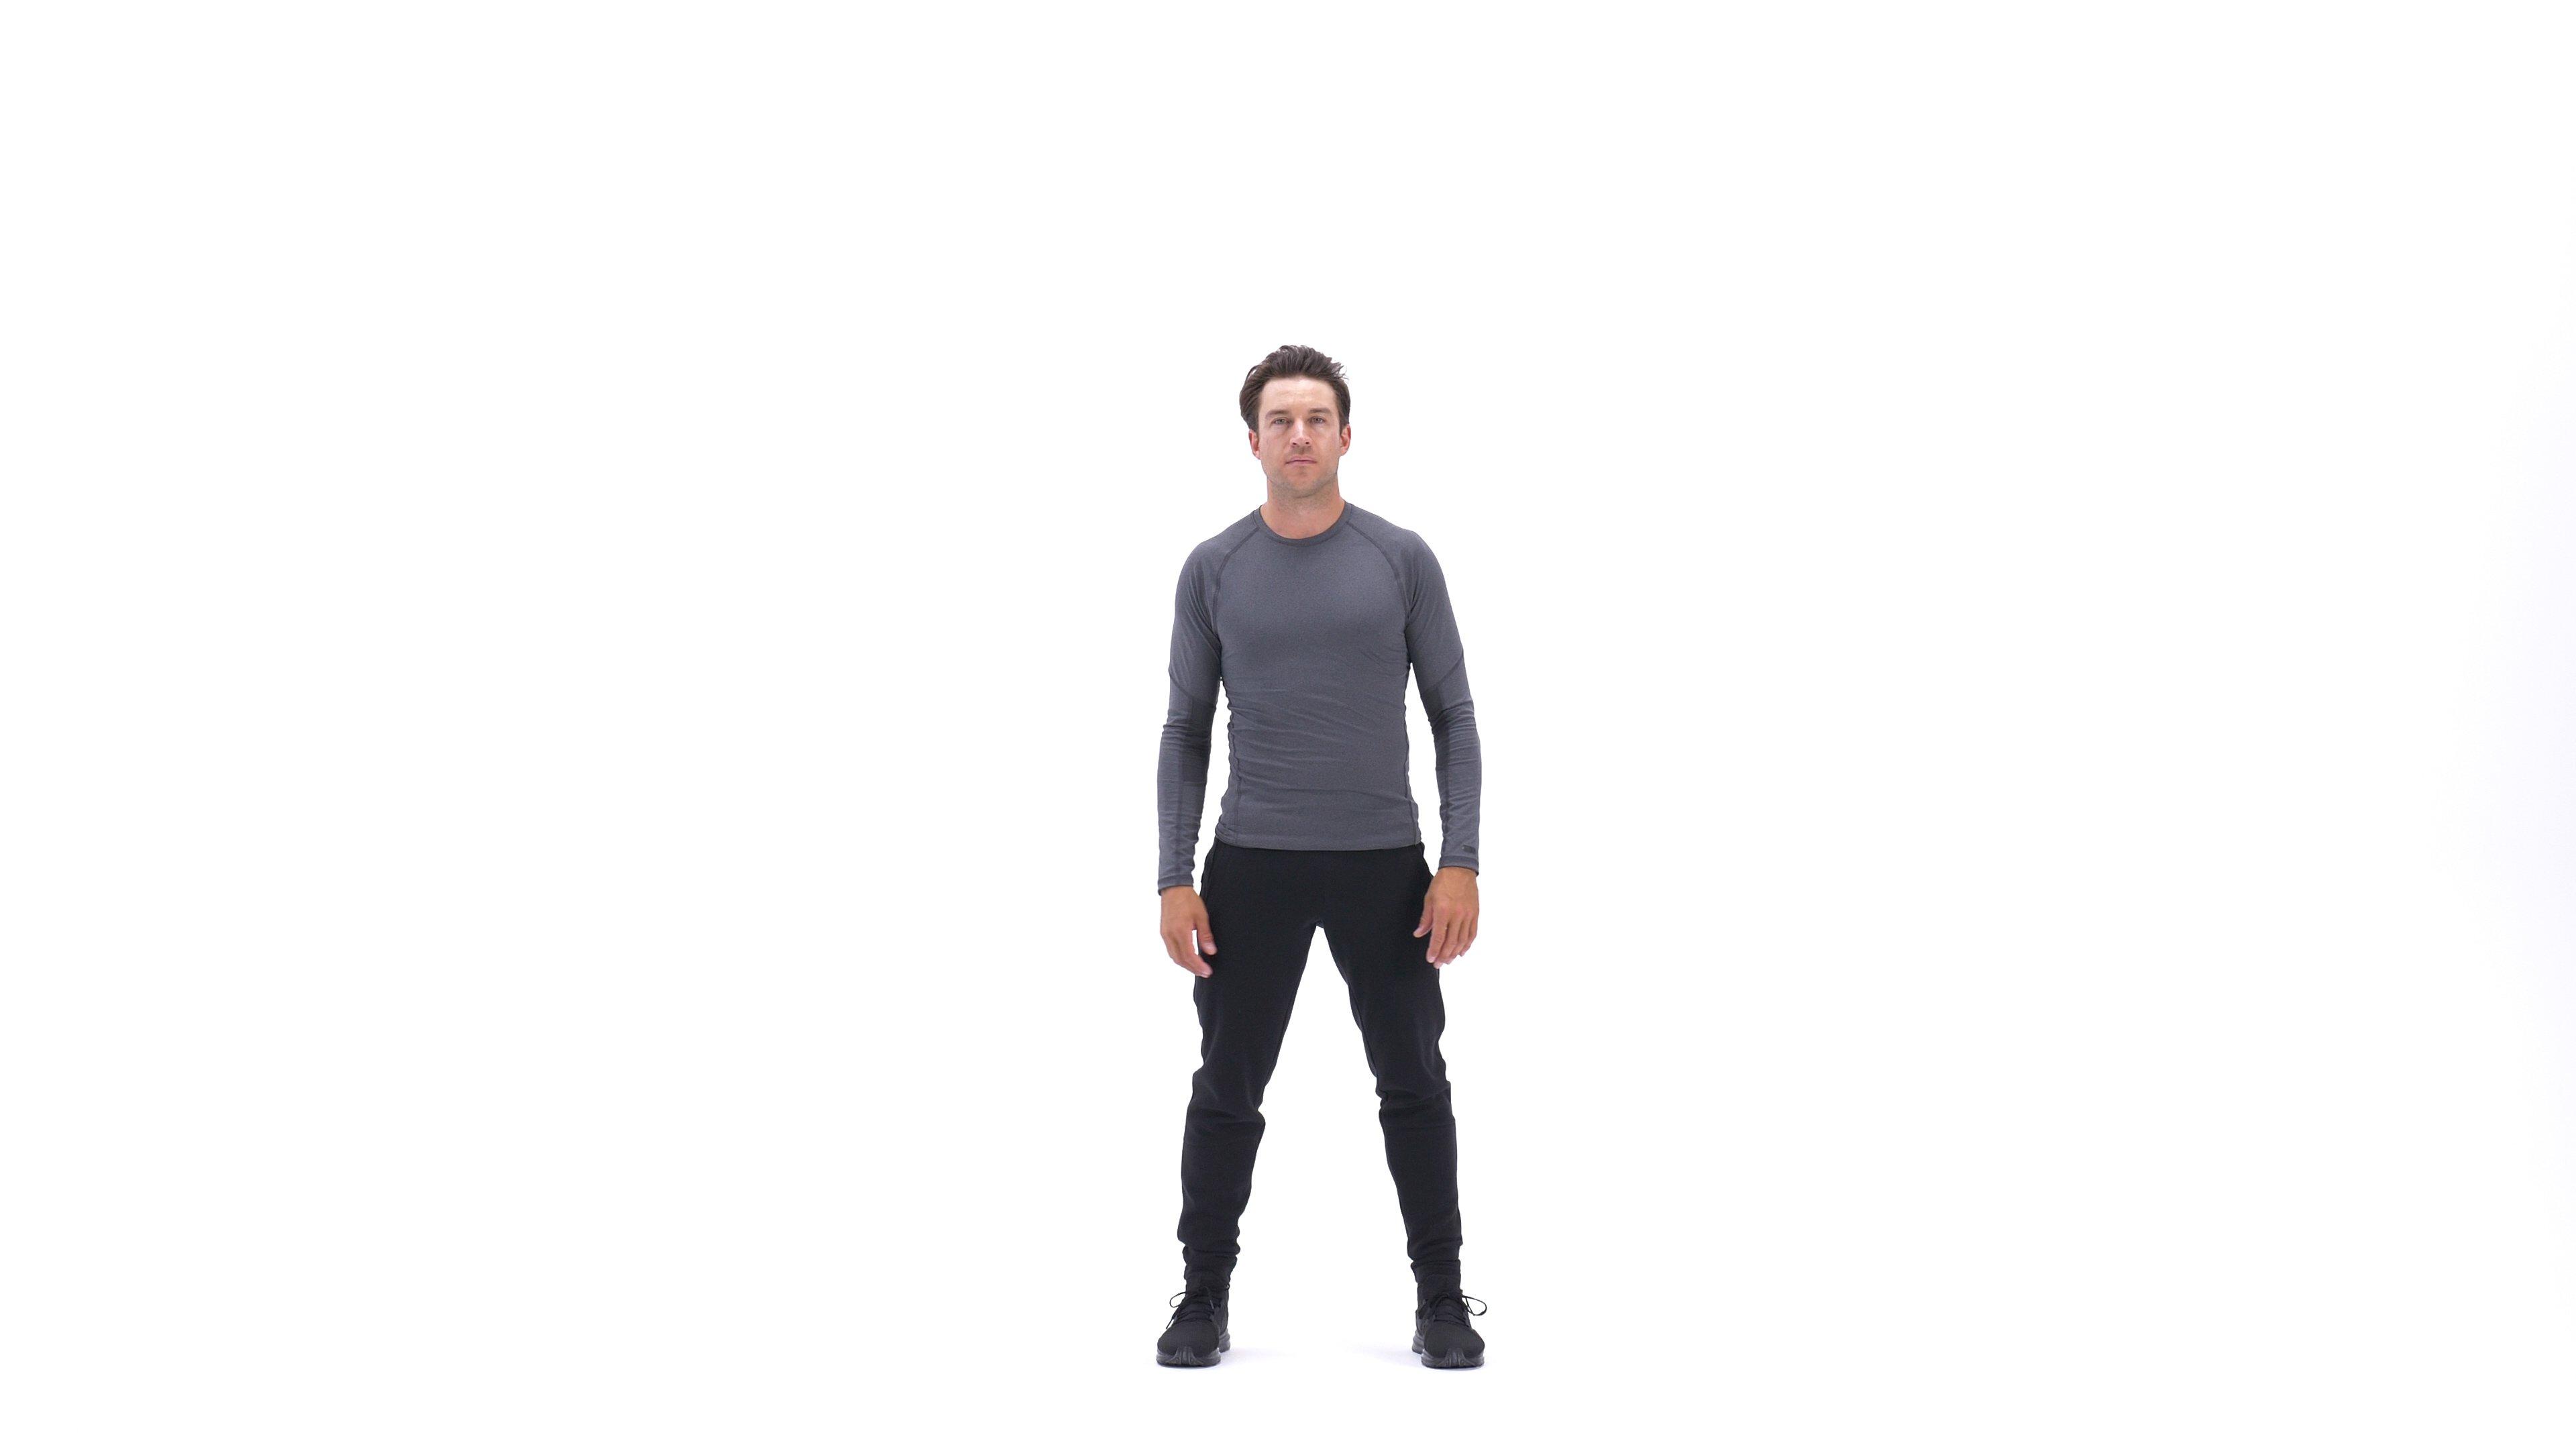 Jump Squat image